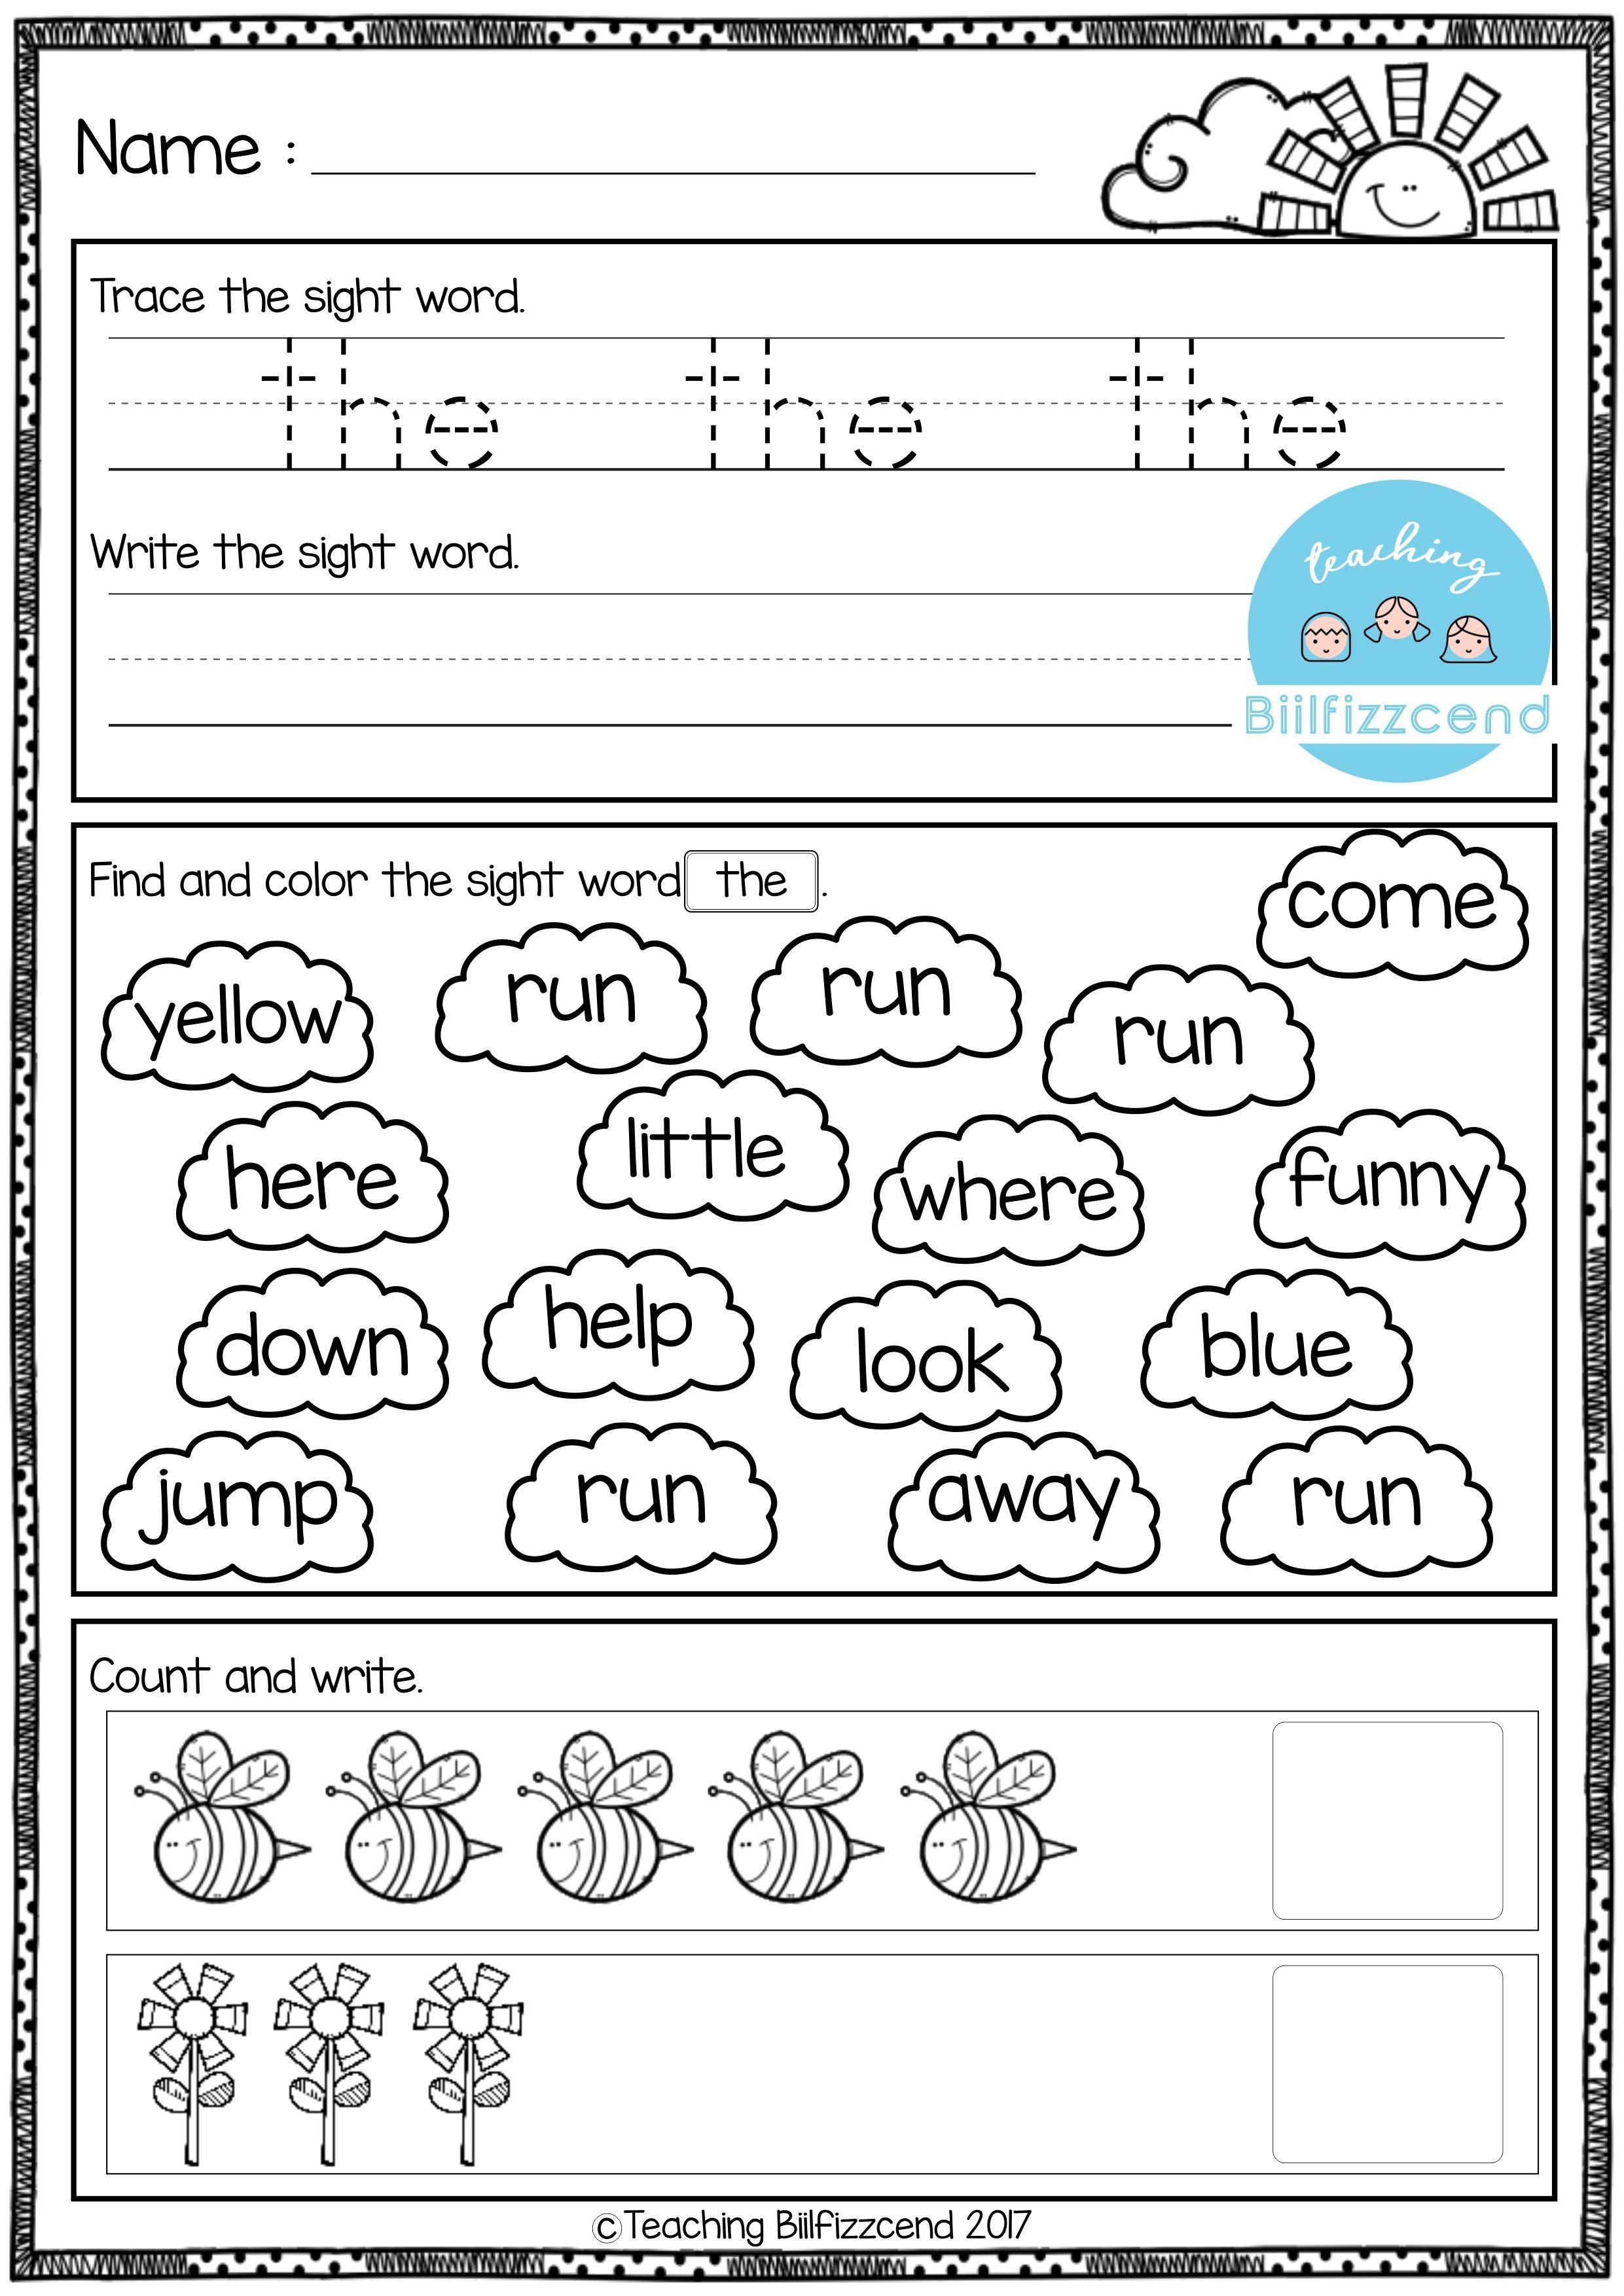 Morning Worksheets for Kindergarten Free Kindergarten Morning Work